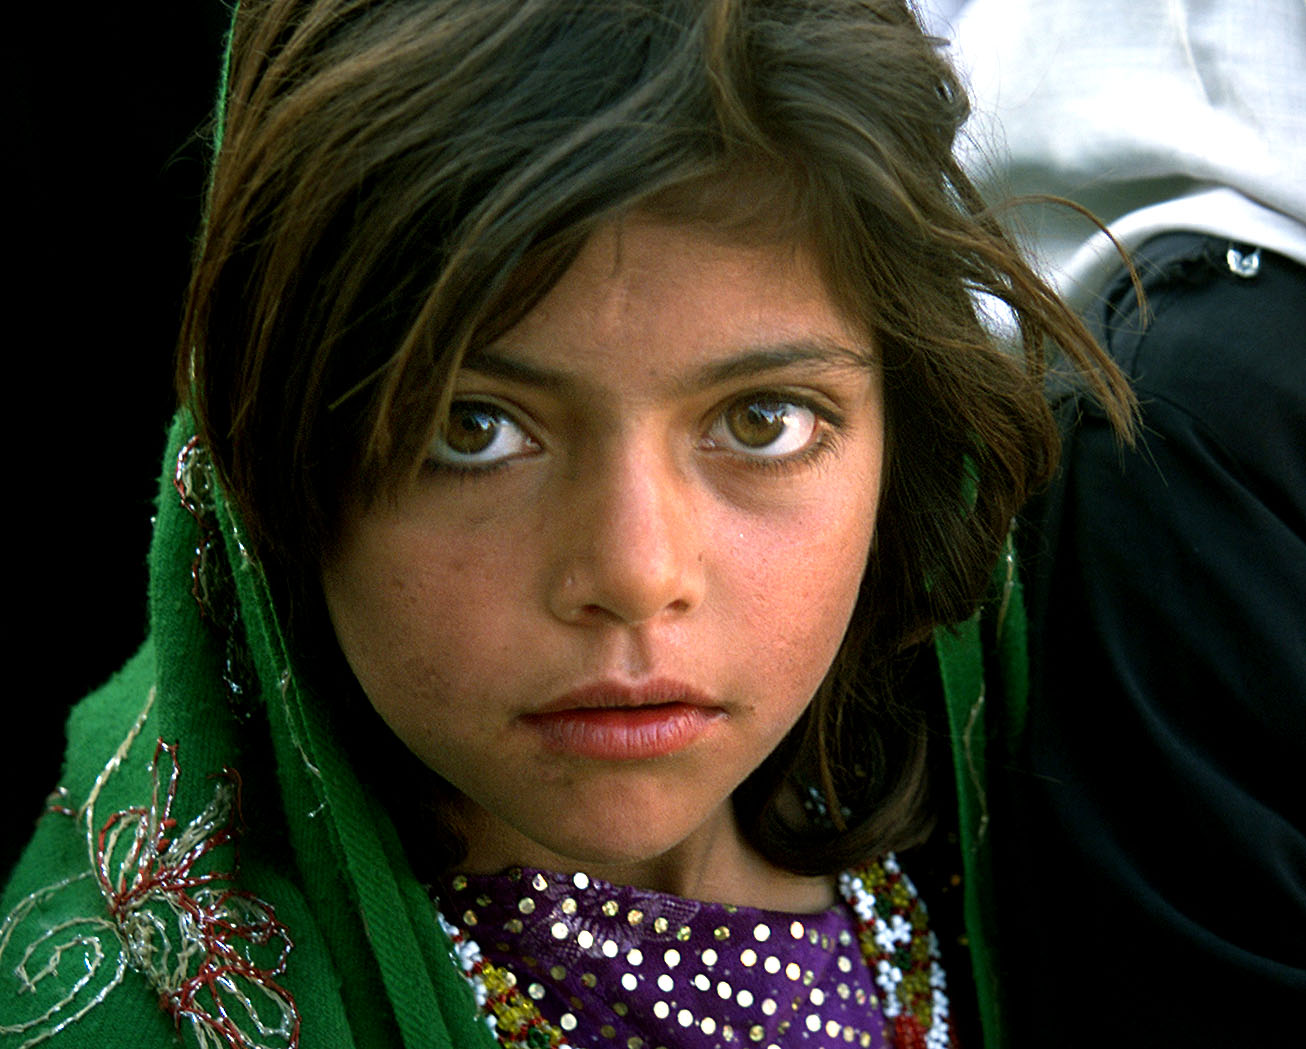 green-penis-afghani-nuder-girl-pict-world